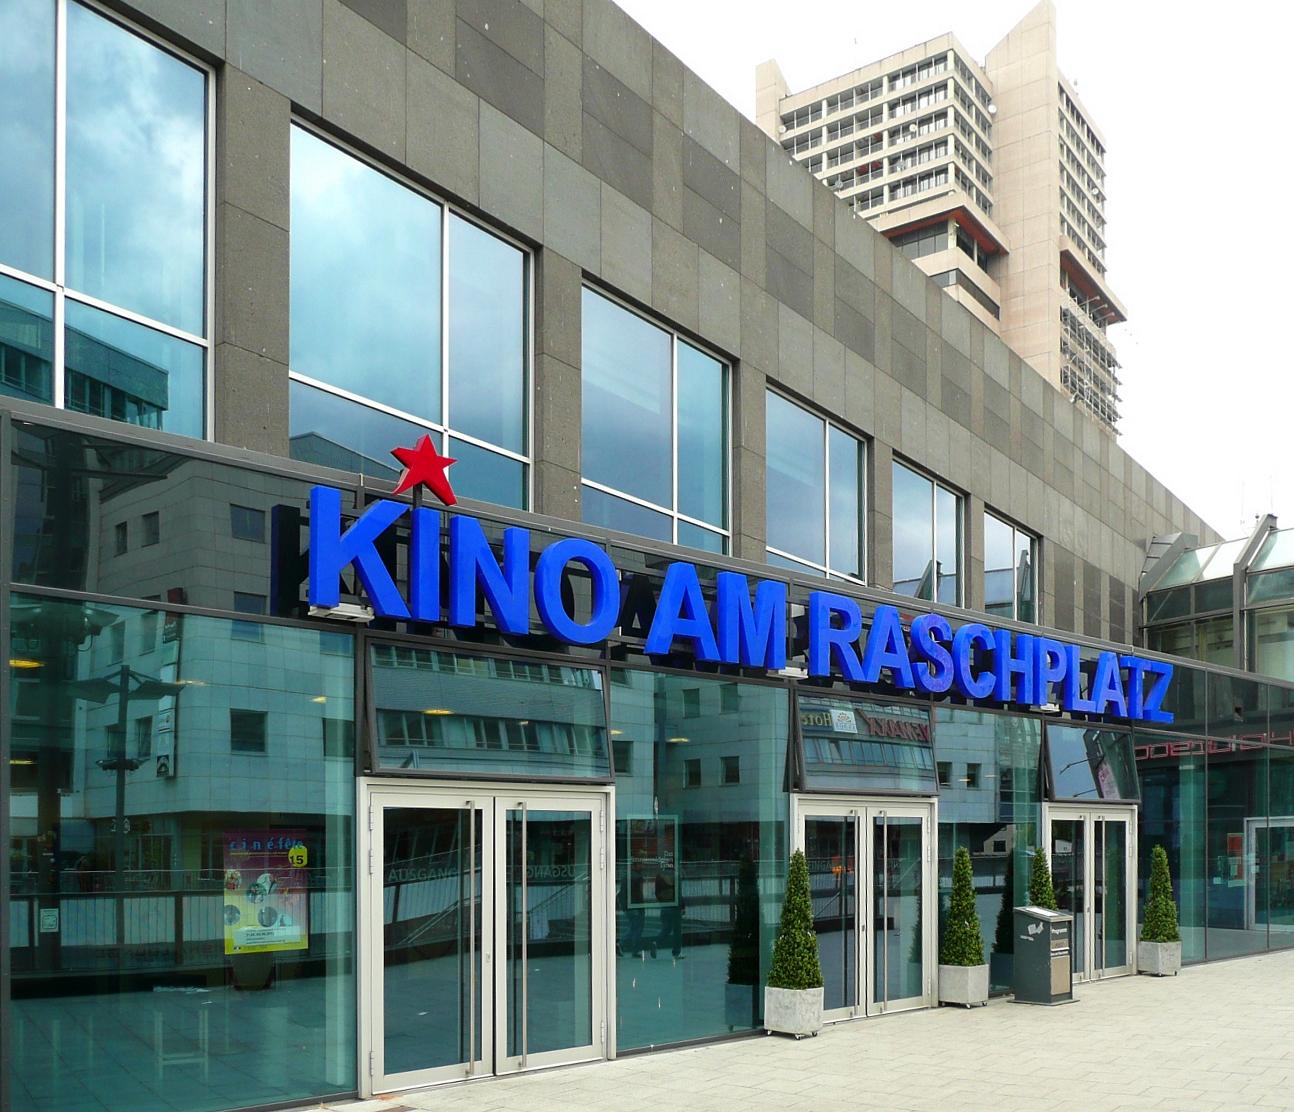 Raschplatz Kino Hannover Programm